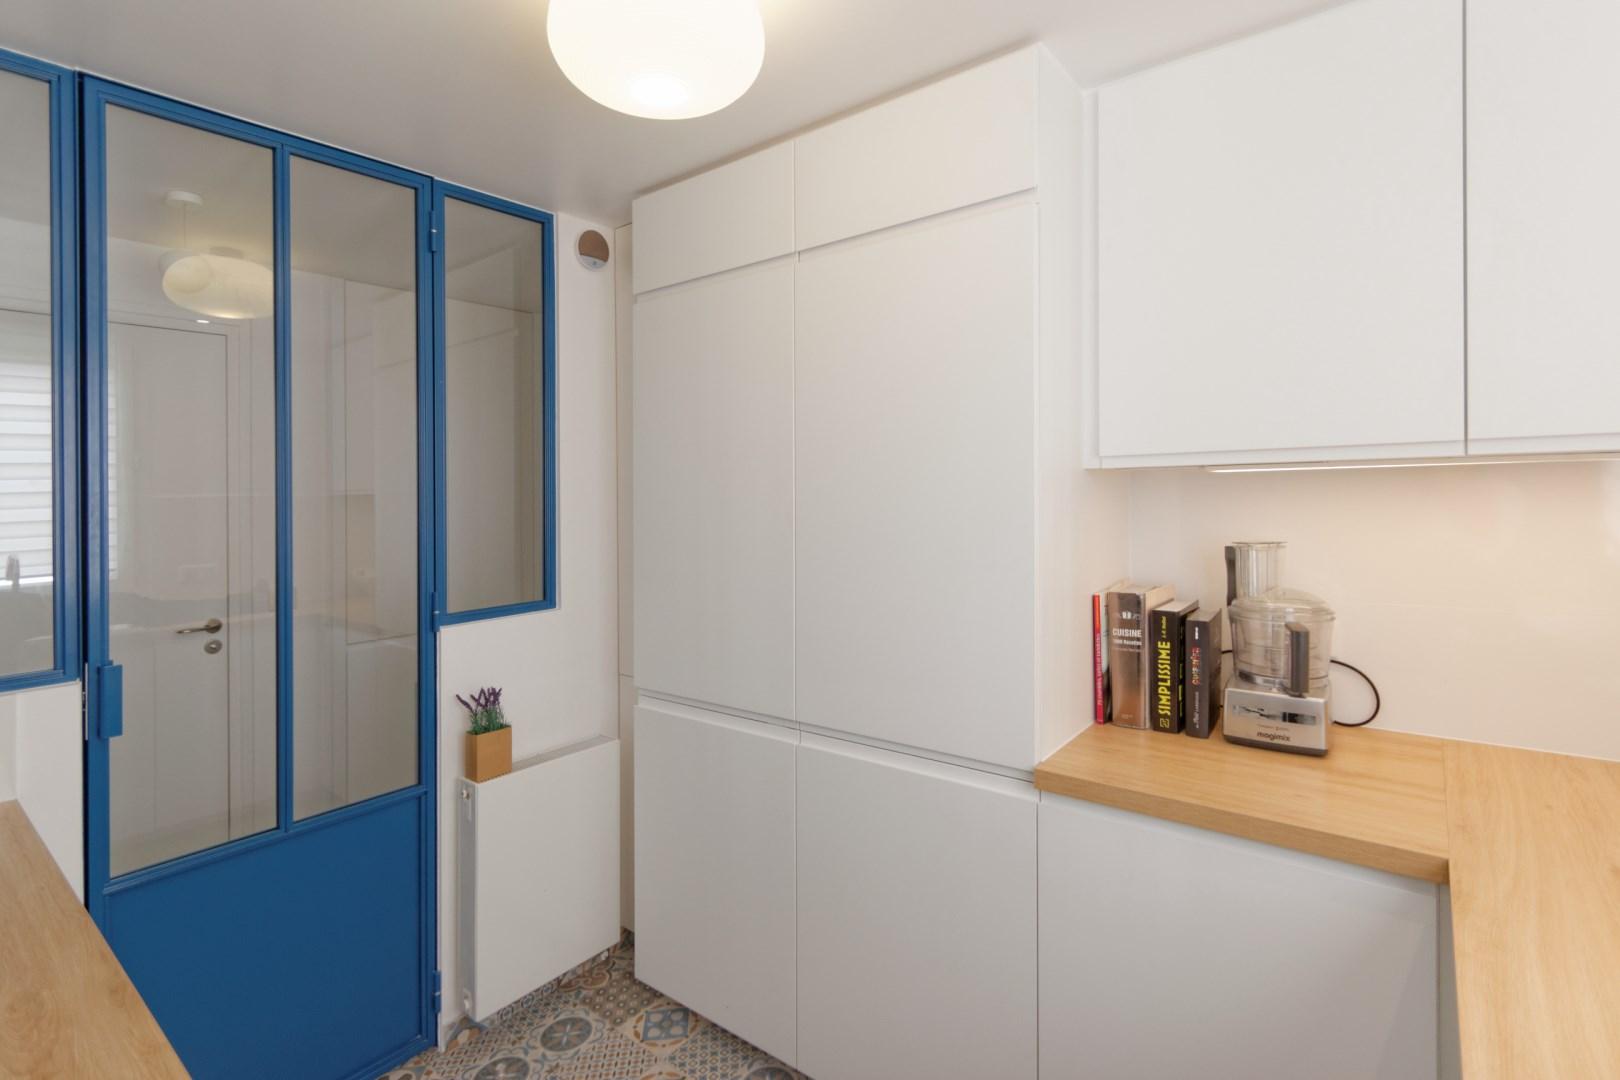 Renovation Verriere Atelier Cuisine Ikea